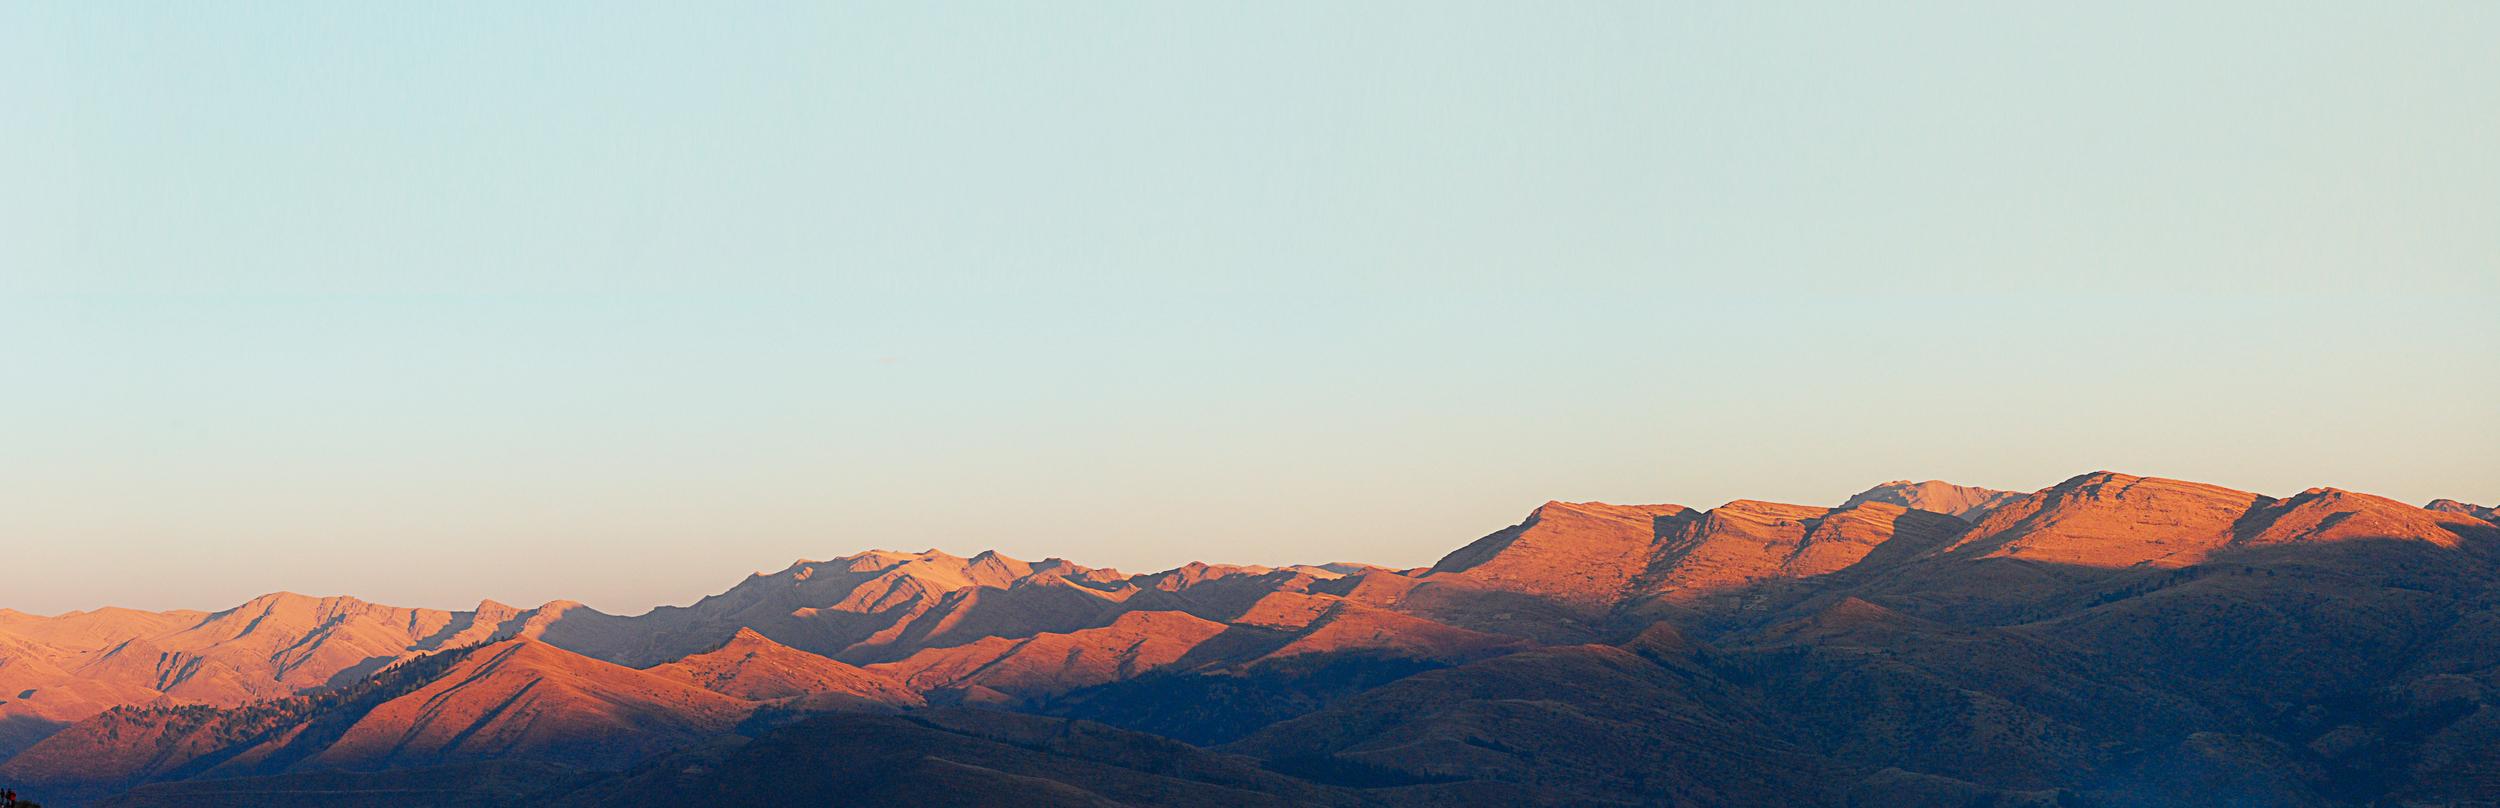 Cusco Hills-crop2.jpg